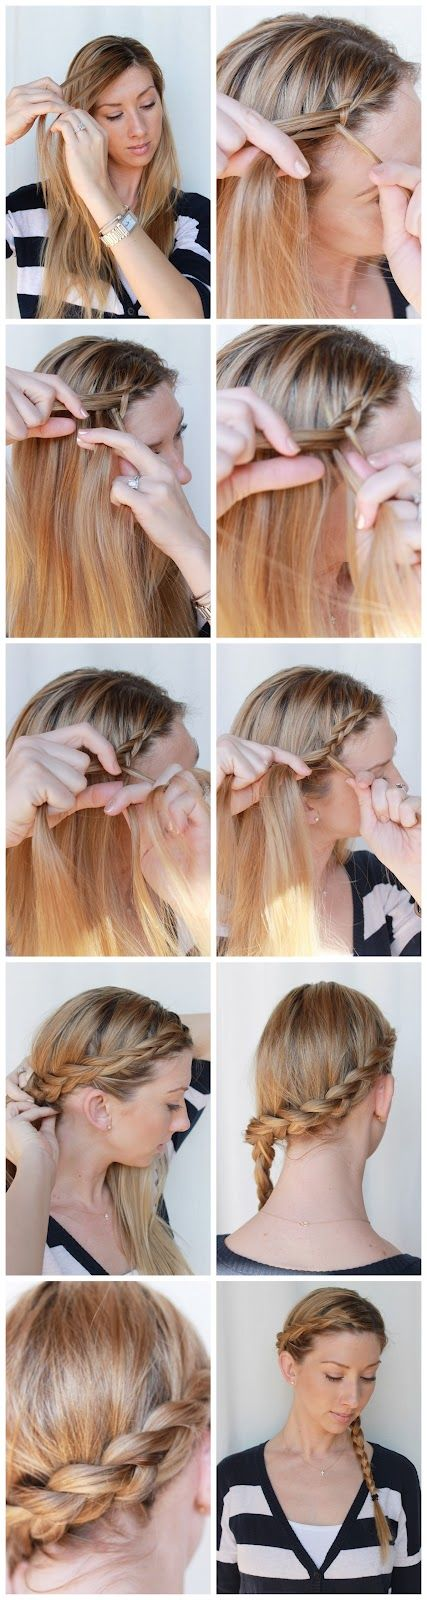 How to: Wrap around side braid: At The Beaches, Braids Hairstyles, Hair Tutorials, Long Hair, Katniss Braids, Hair Style, Side Braids, Twists Braids, Things Beautiful